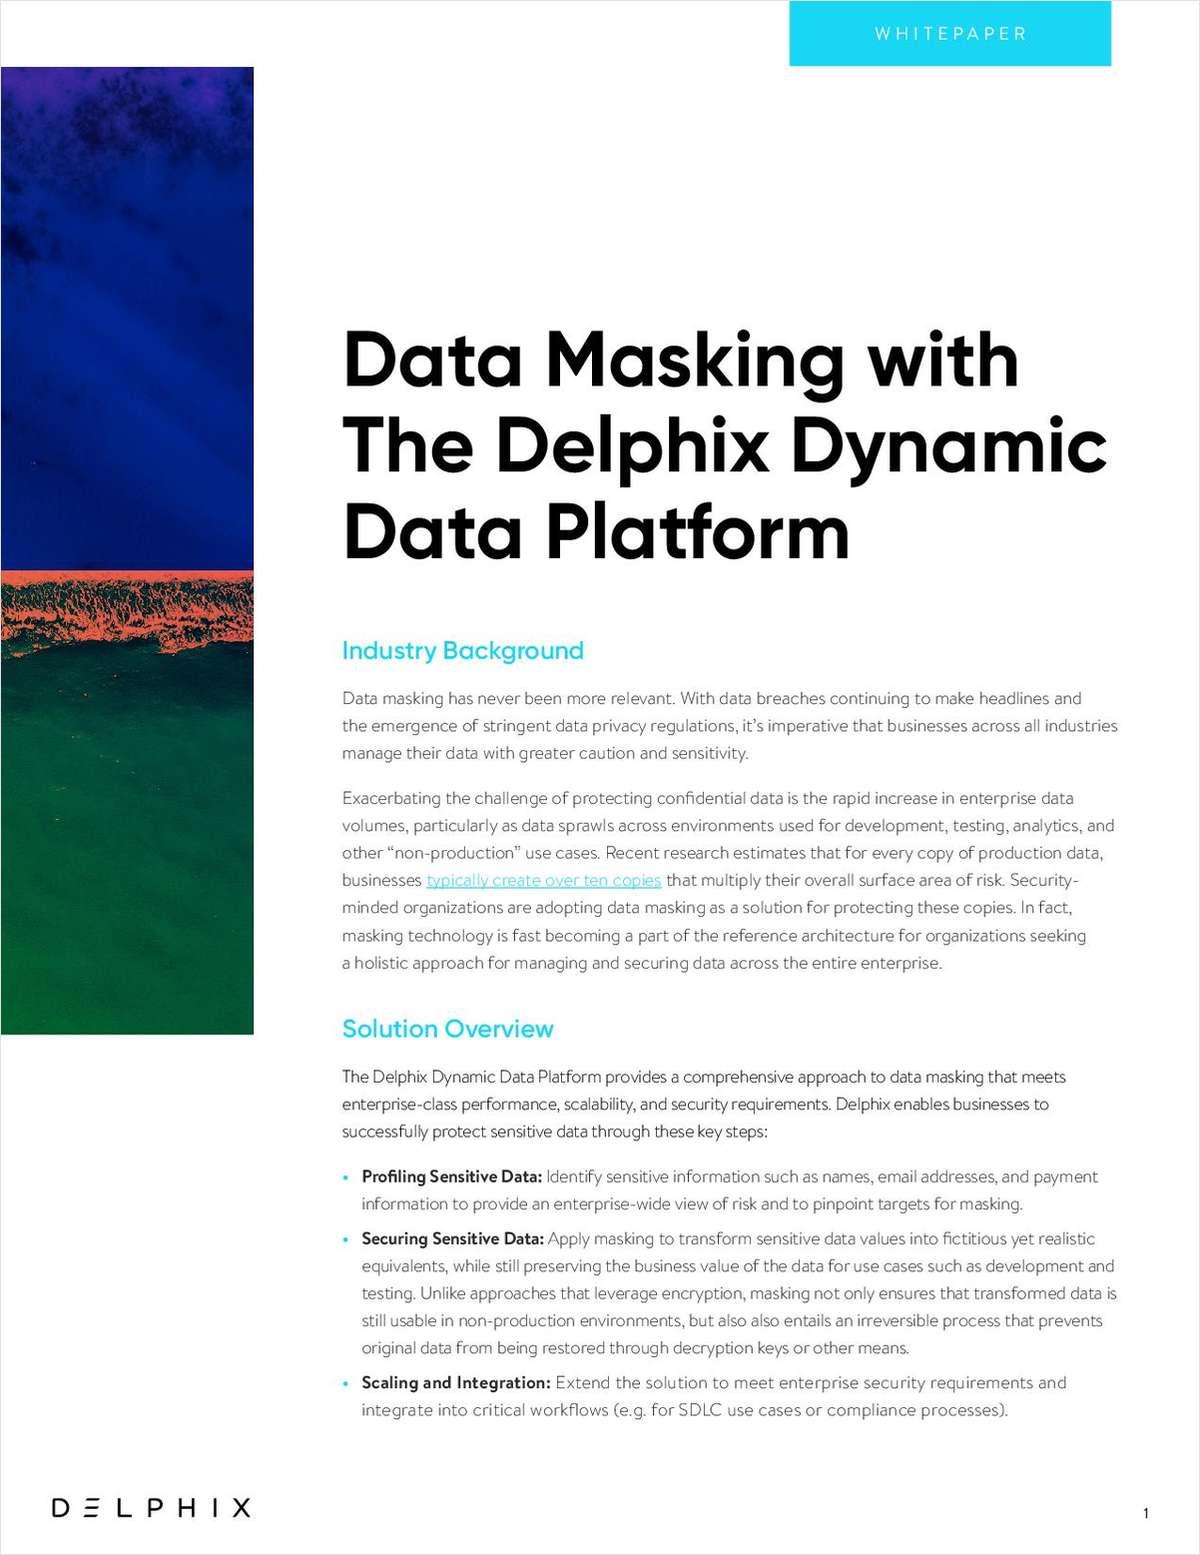 Data Masking with the Delphix Dynamic Data Platform